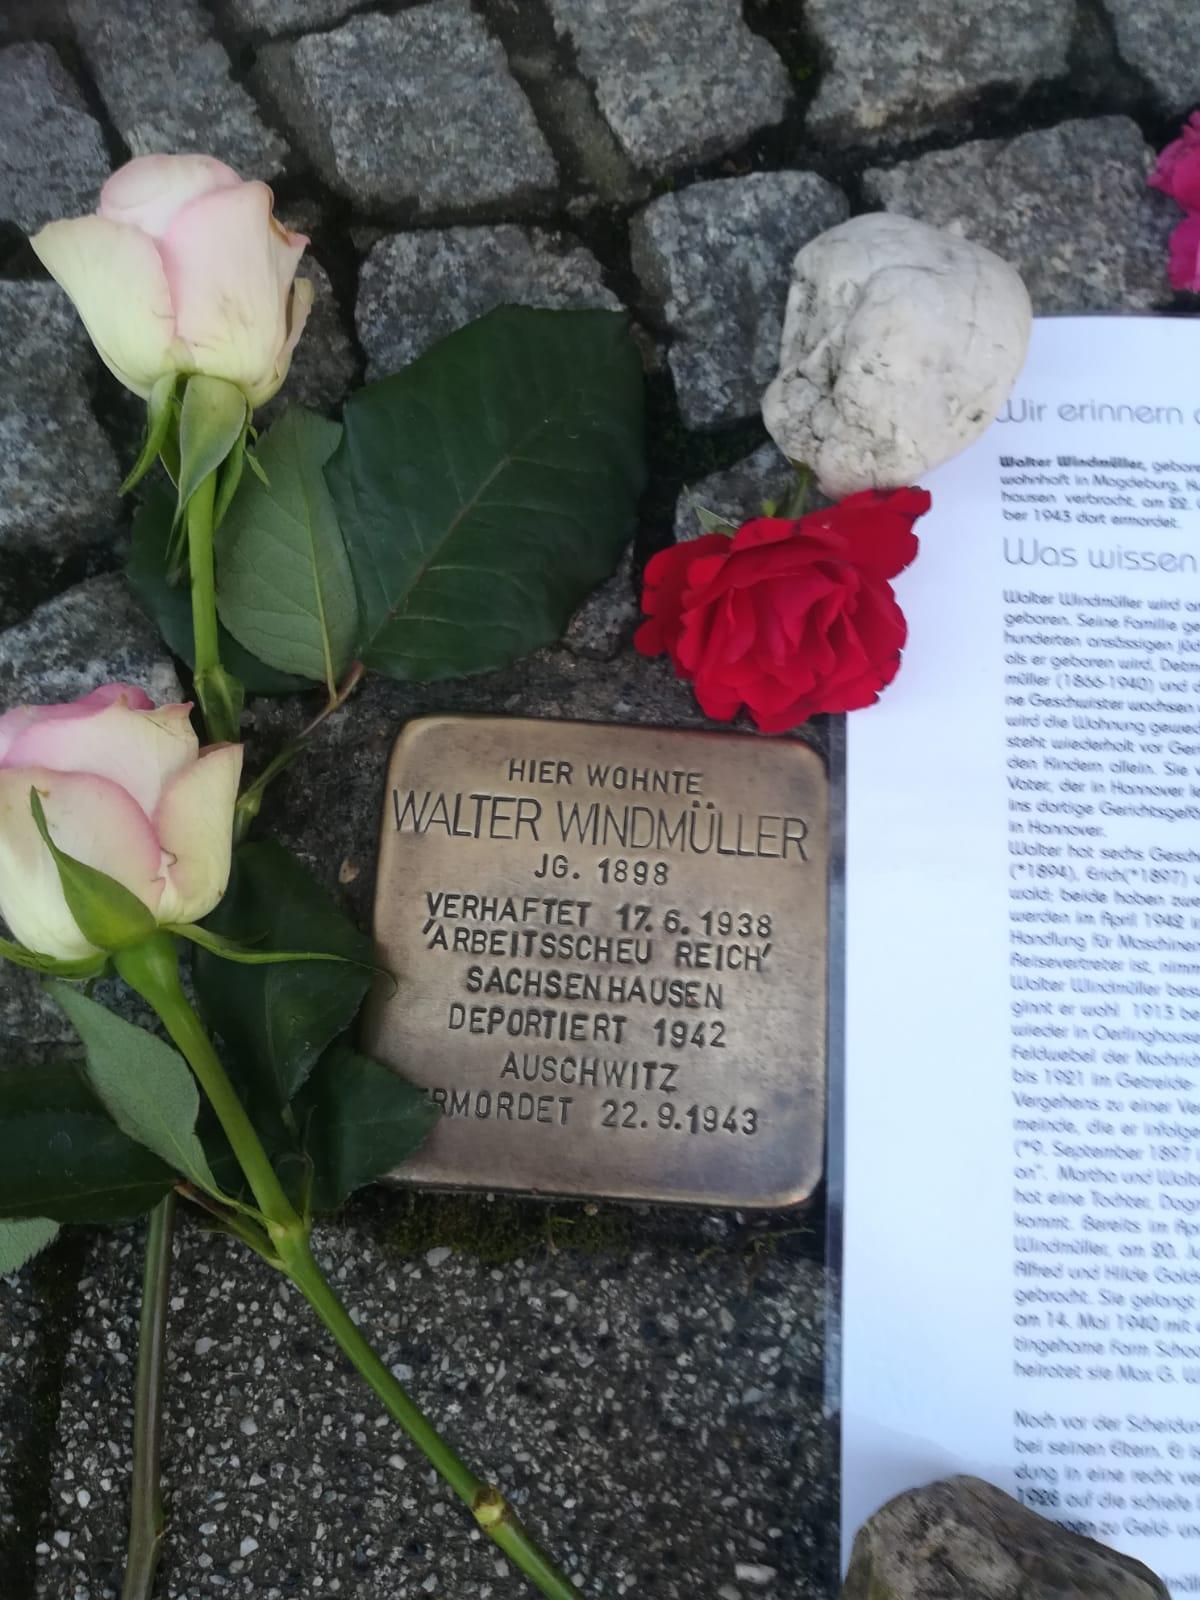 Walter Windmüller